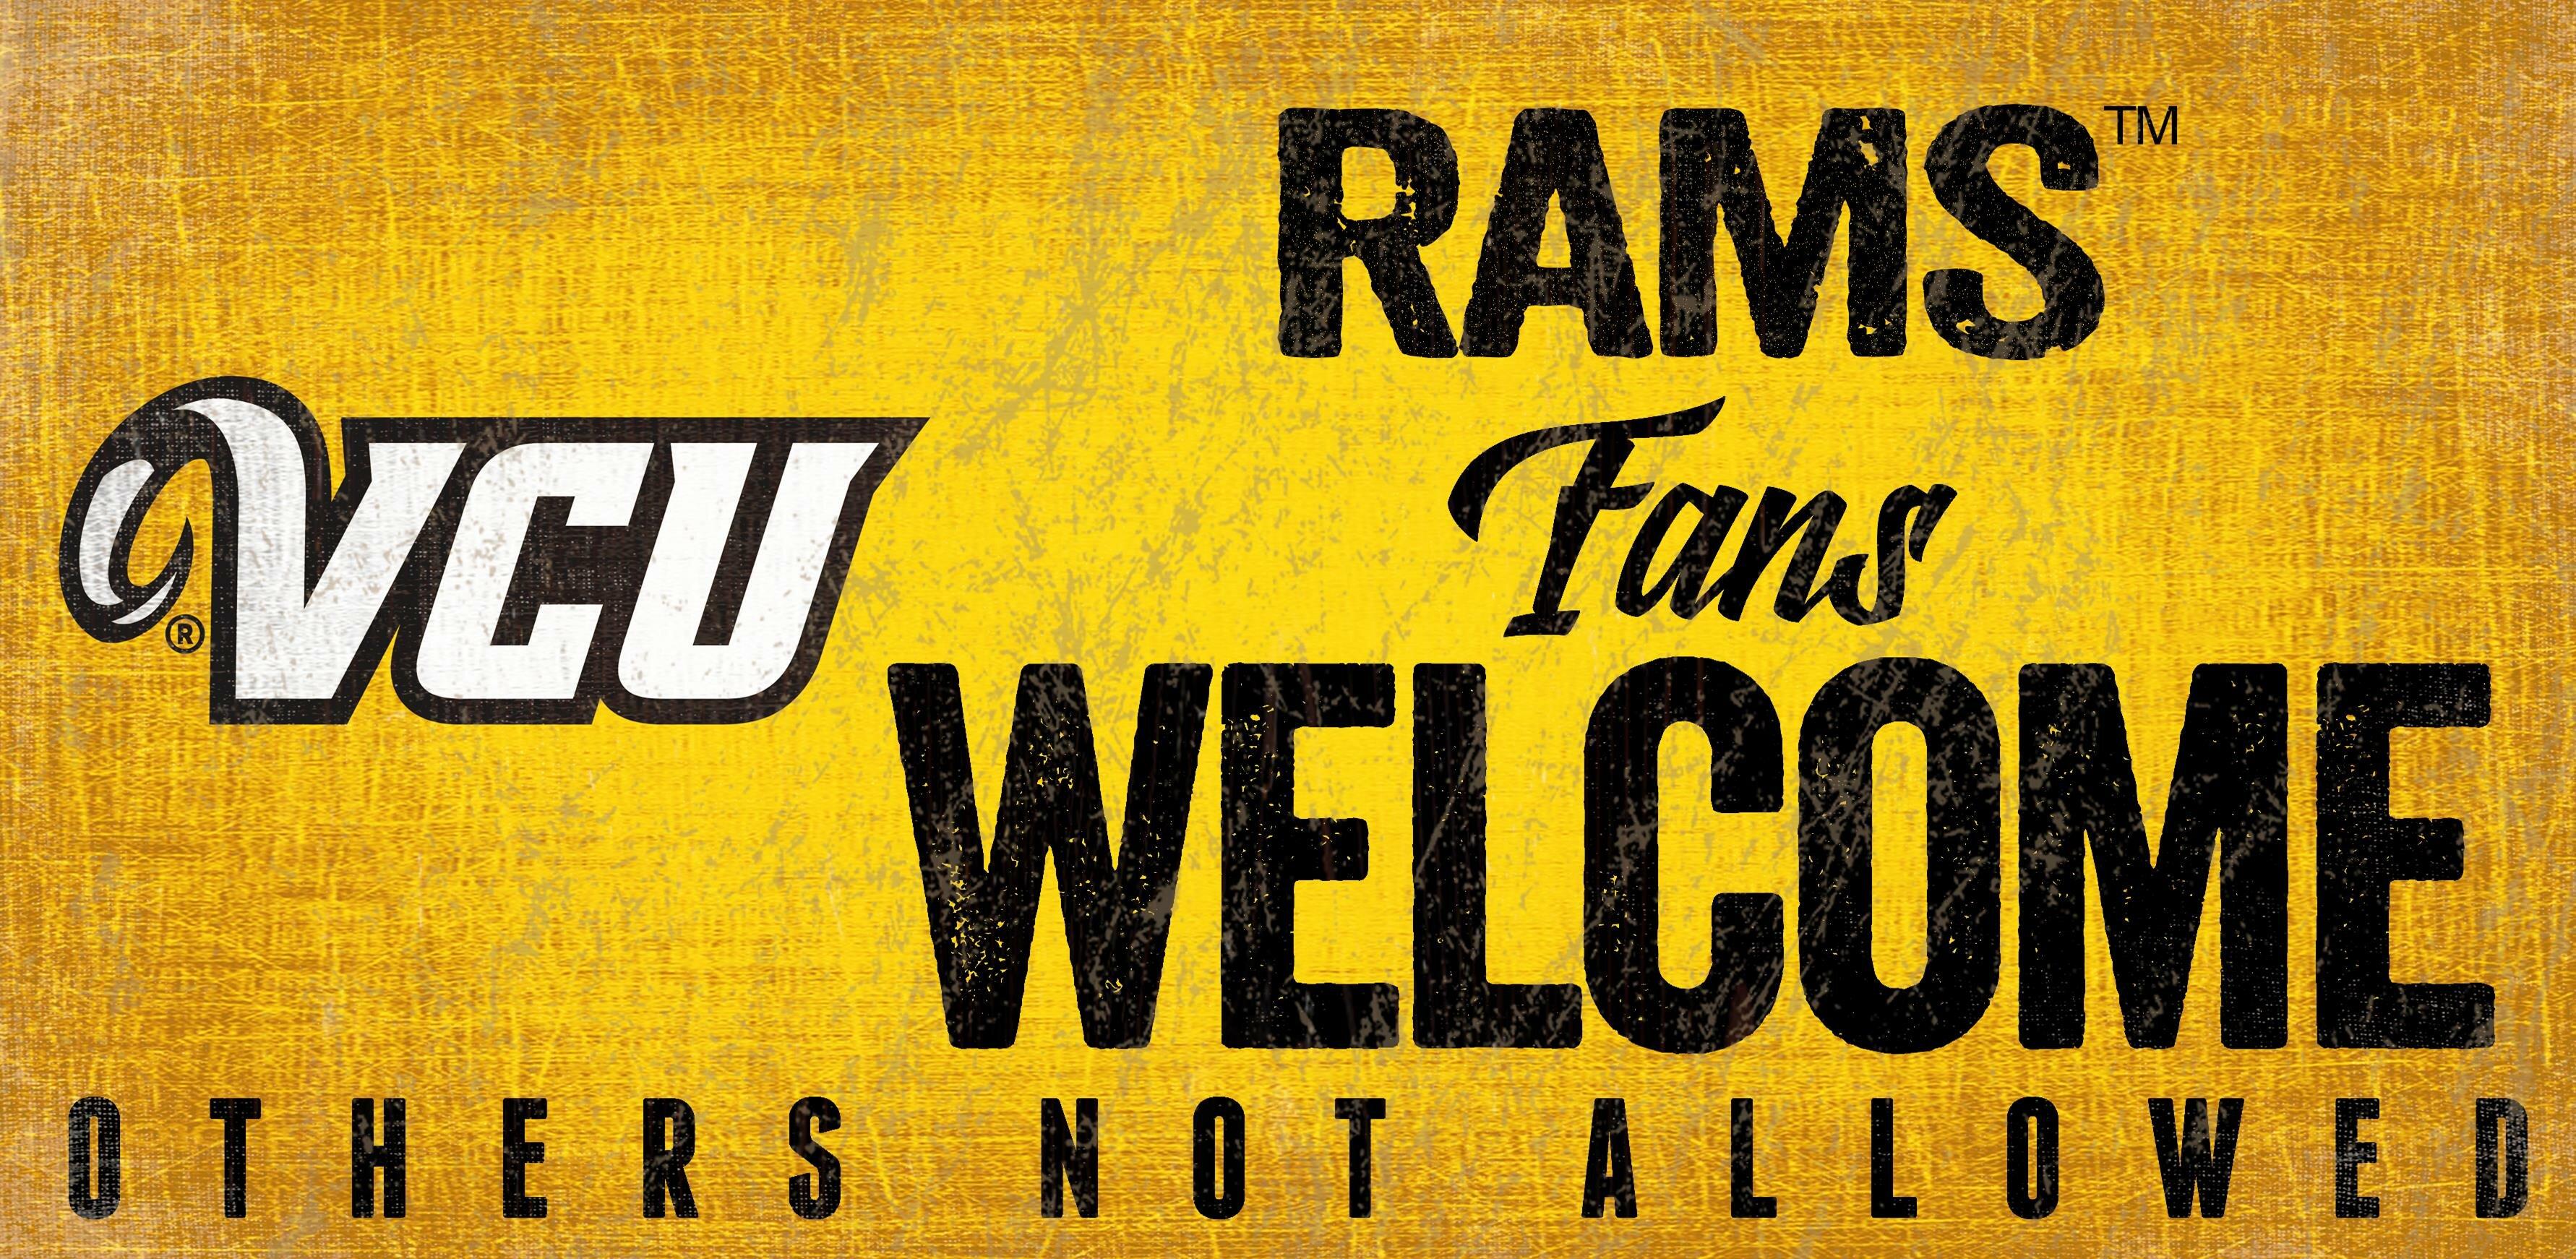 Fan Creations NCAA Fans Welcome Sign Wall Décor | Wayfair